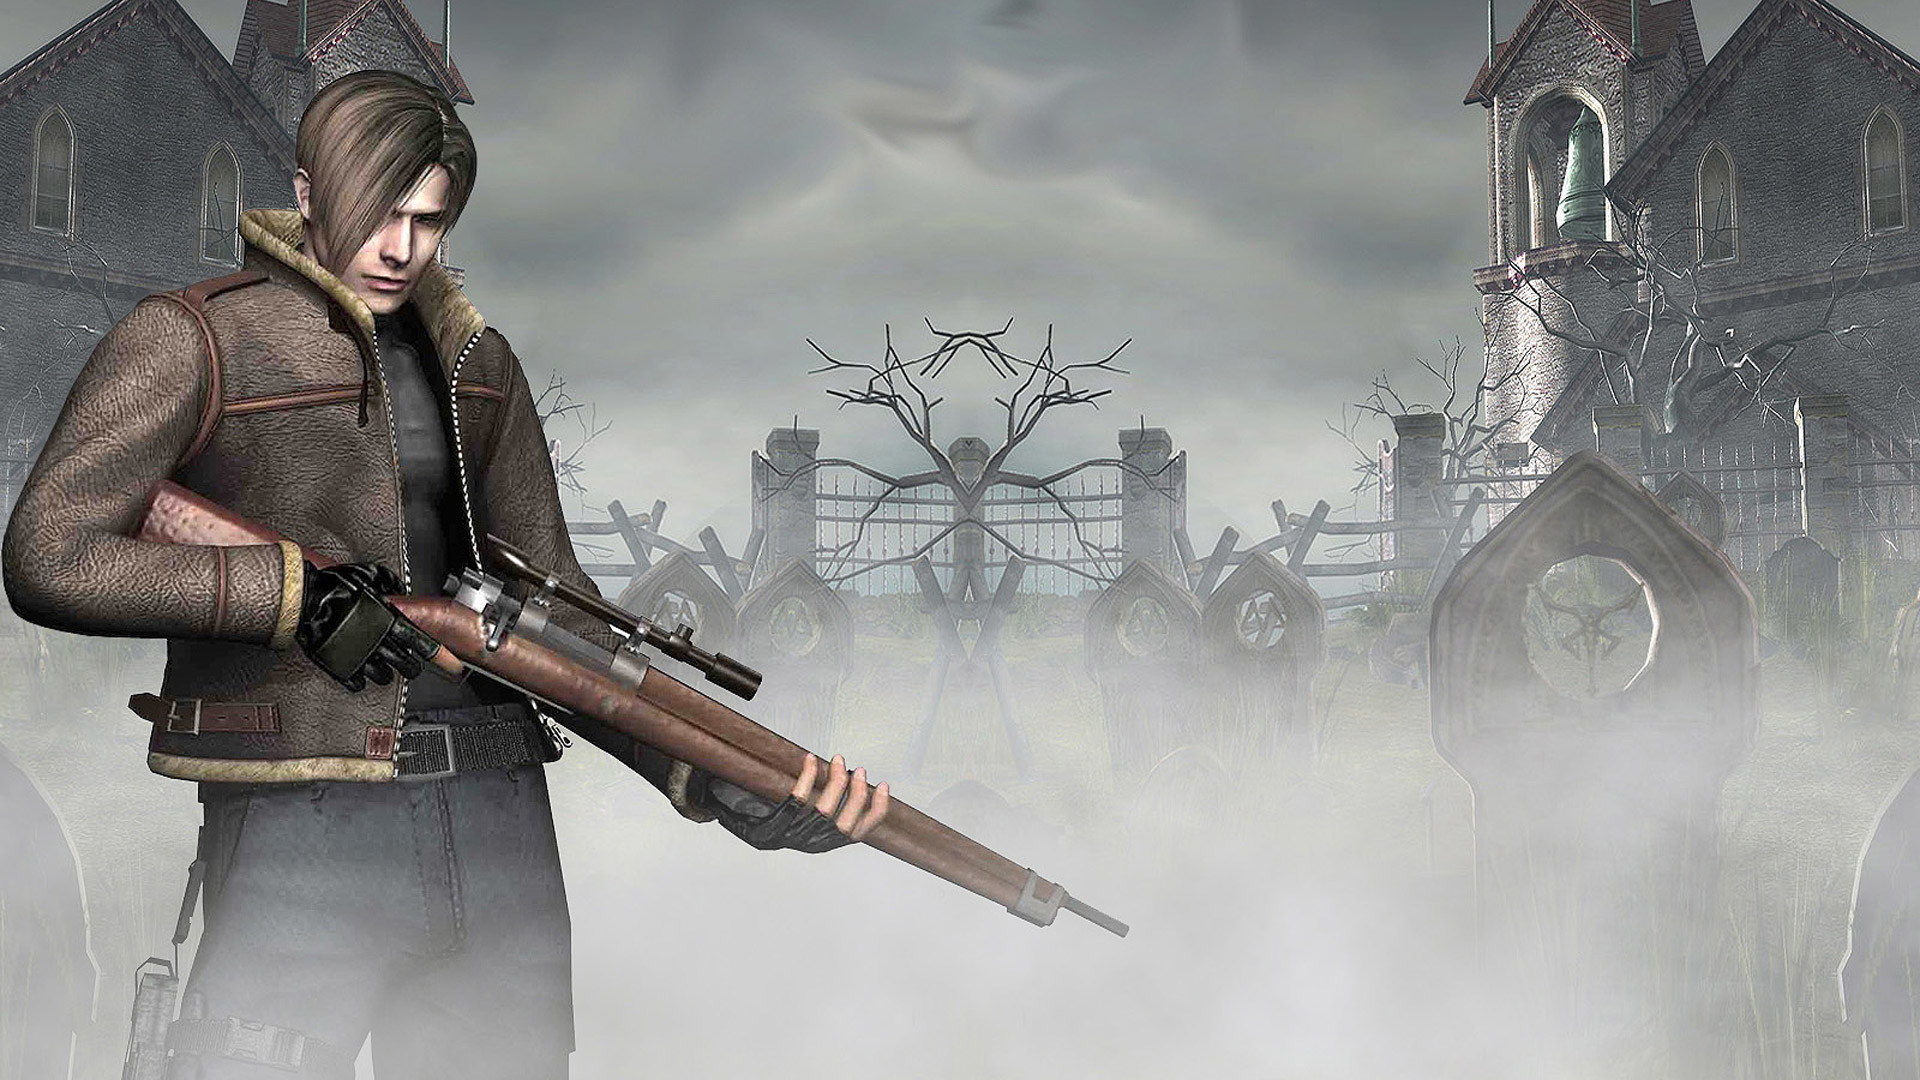 Resident Evil 4 Wallpaper ·â' WallpaperTag